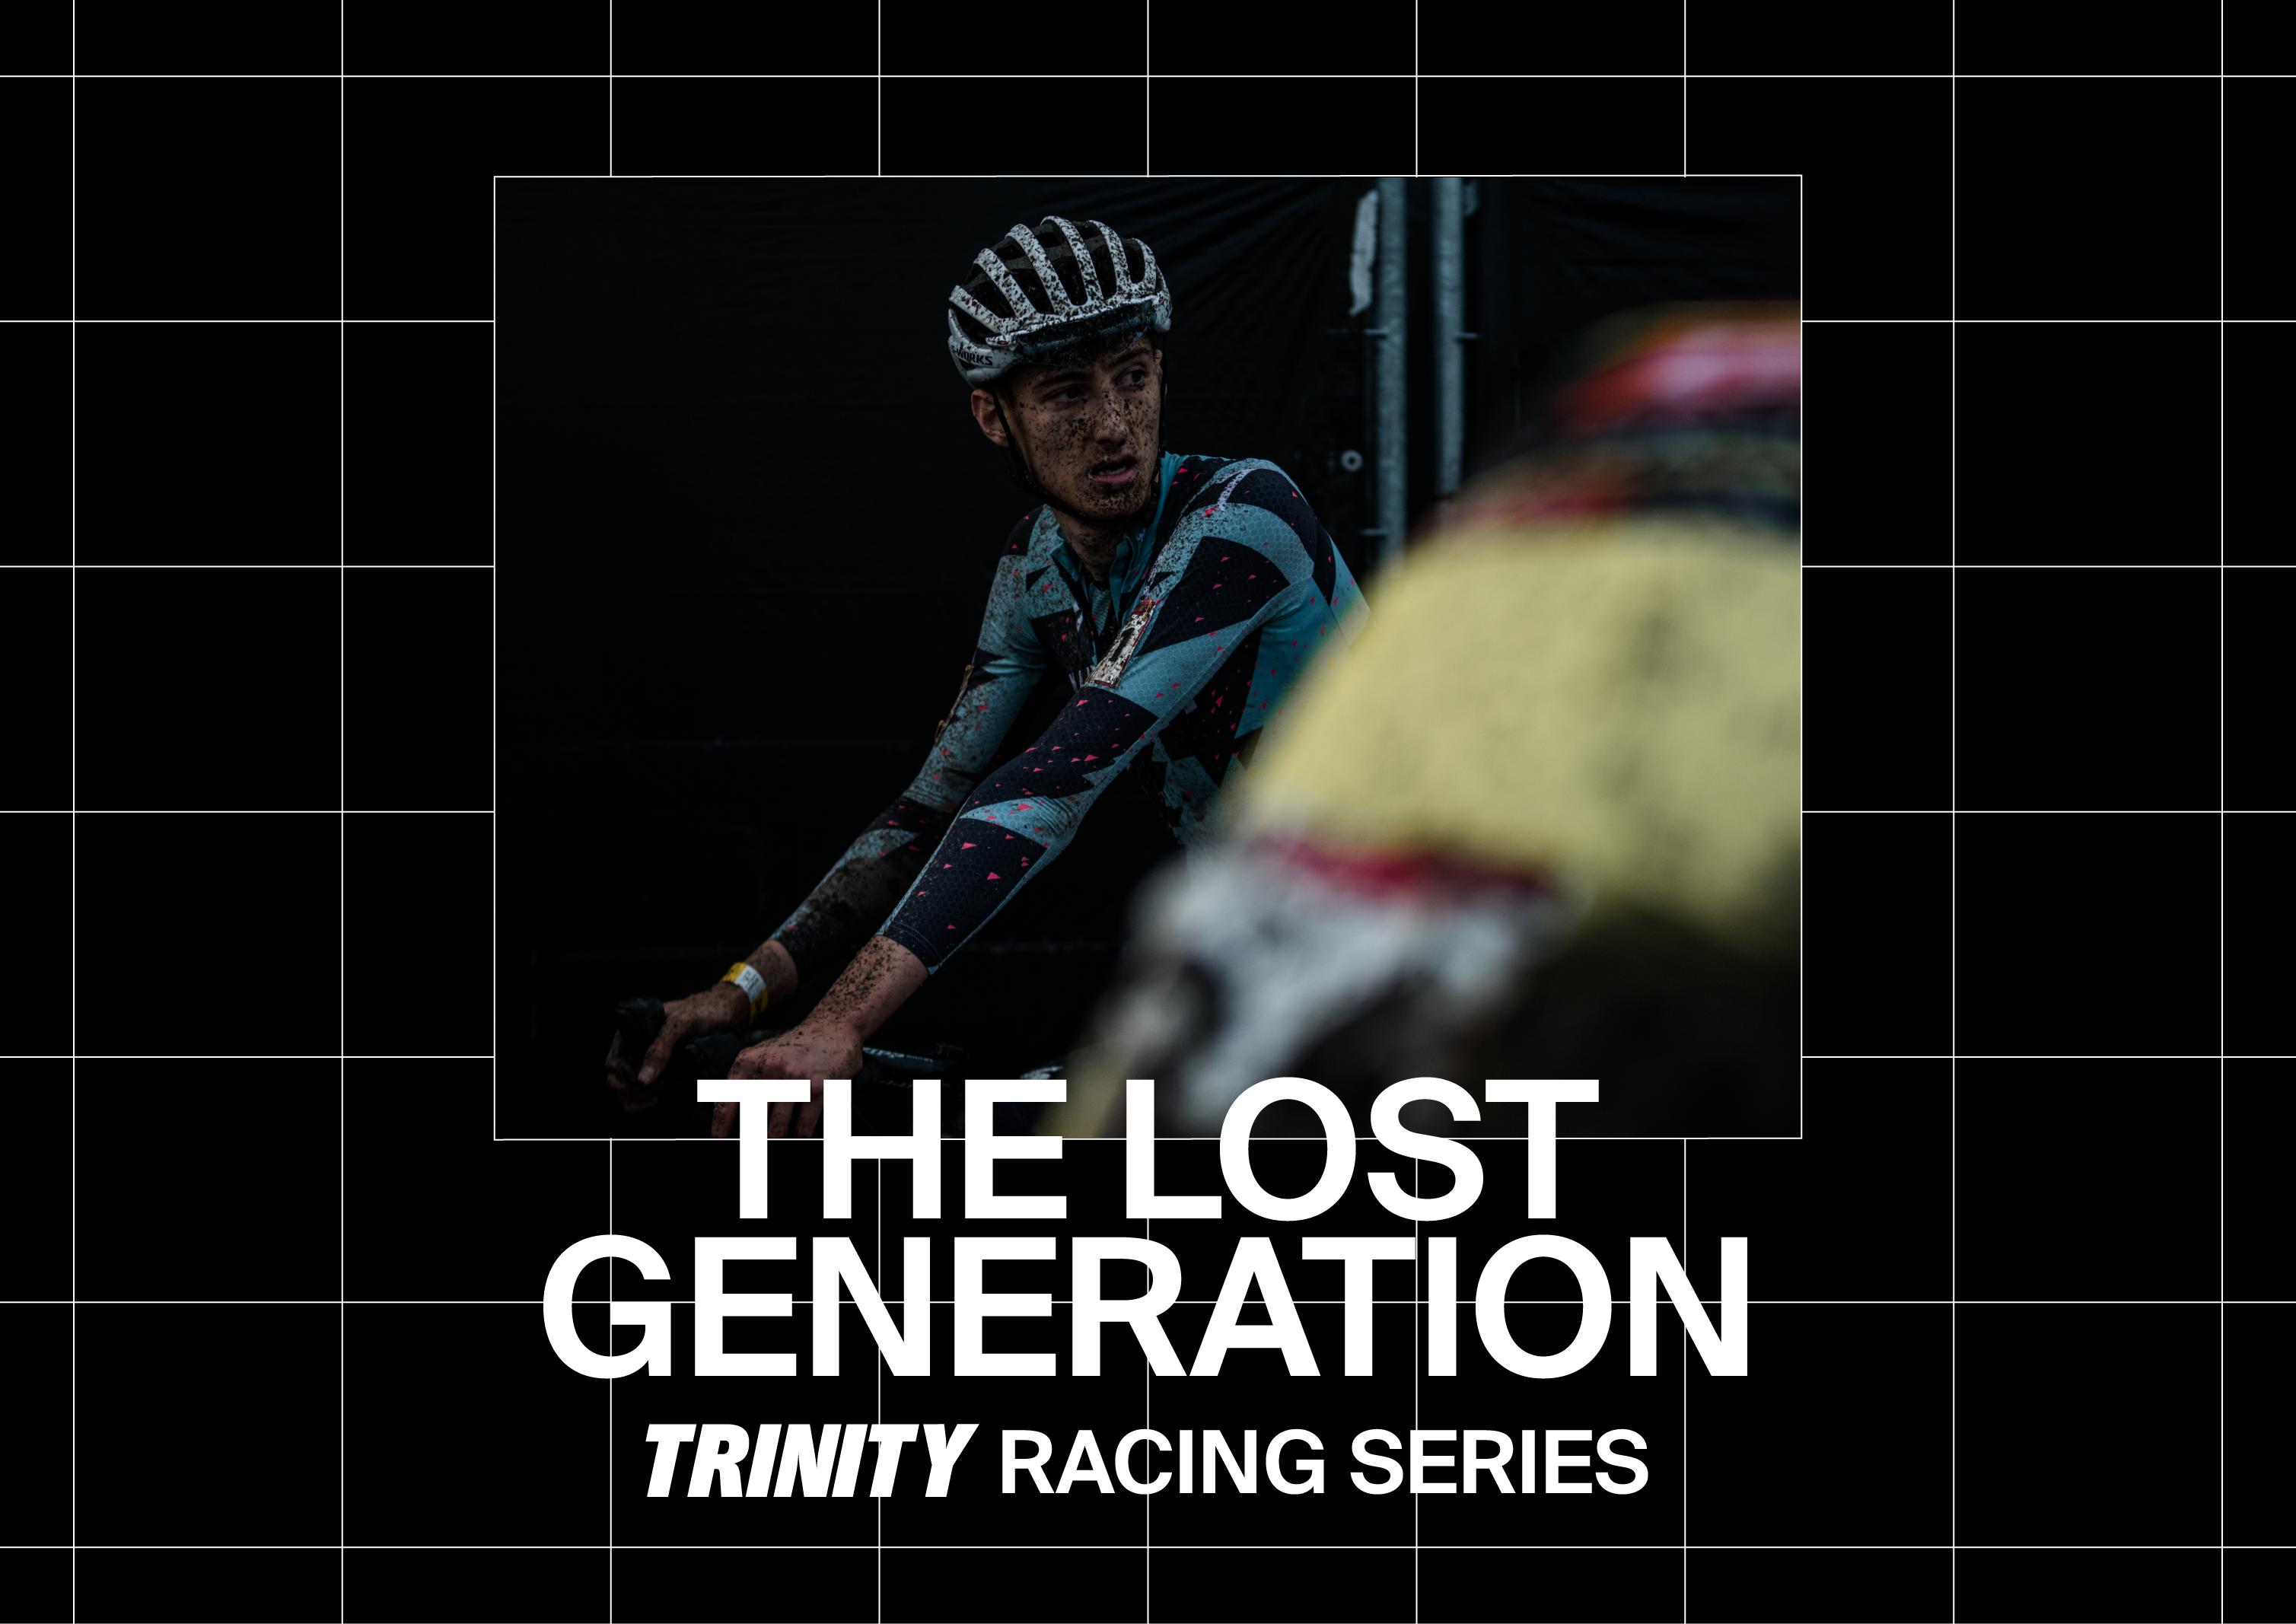 TRINITY Racing Zwift The Lost Generation U23 racing Series